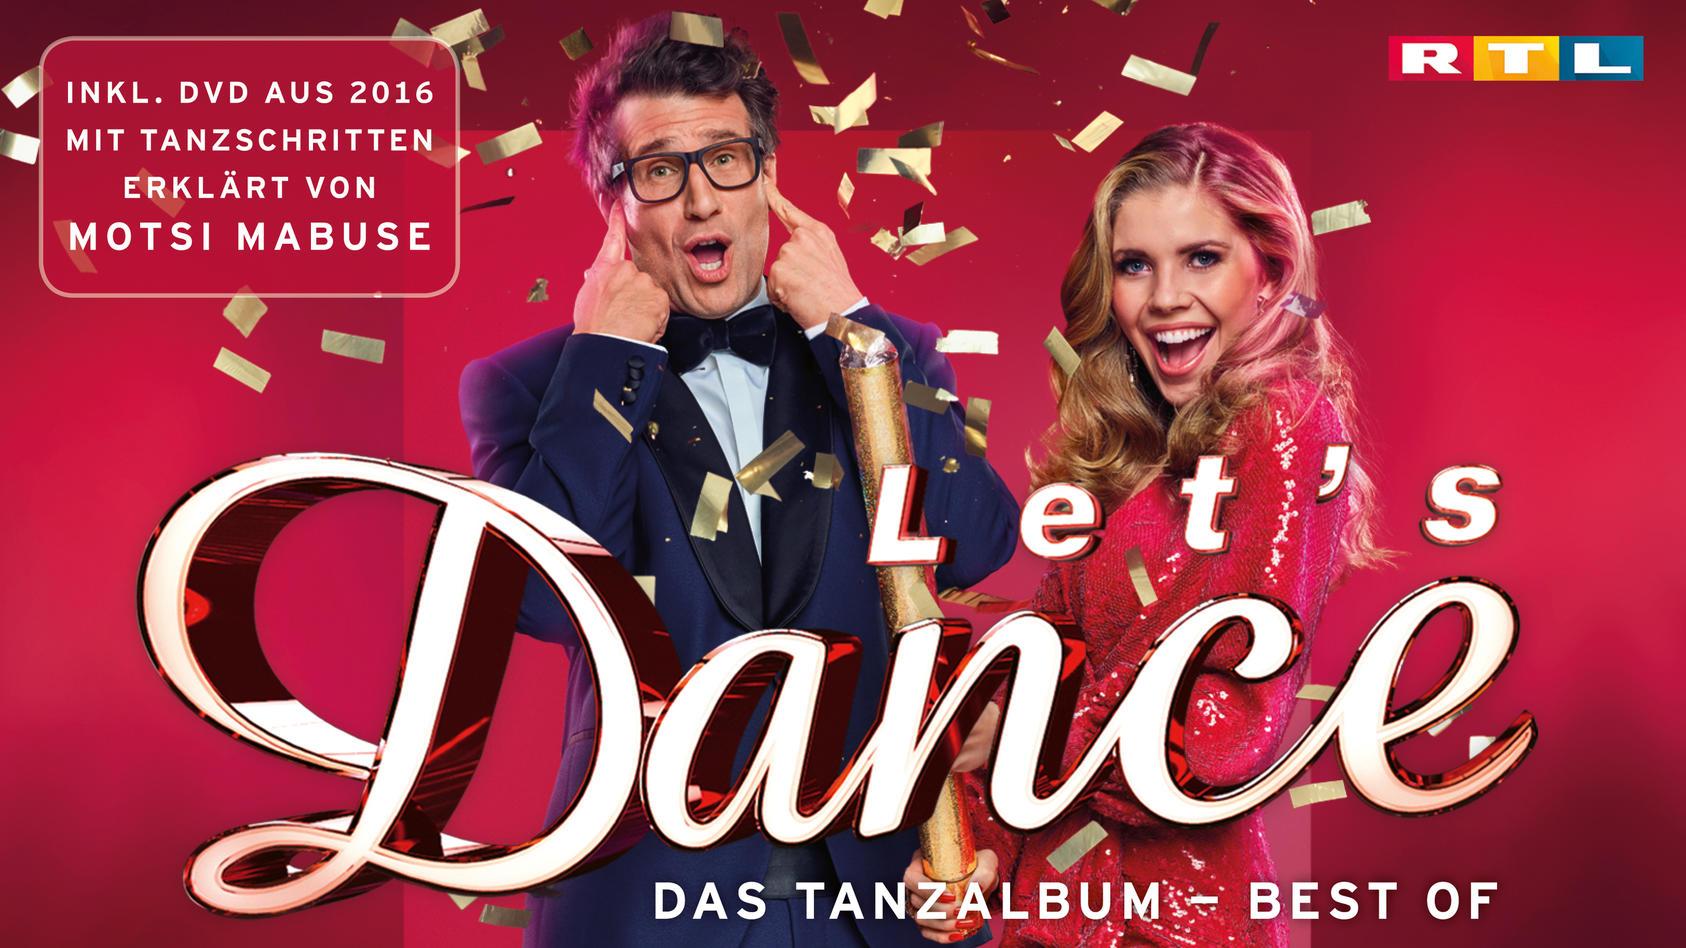 Ab dem 6. März überall verfügbar: Let's Dance - Das Tanzalbum.